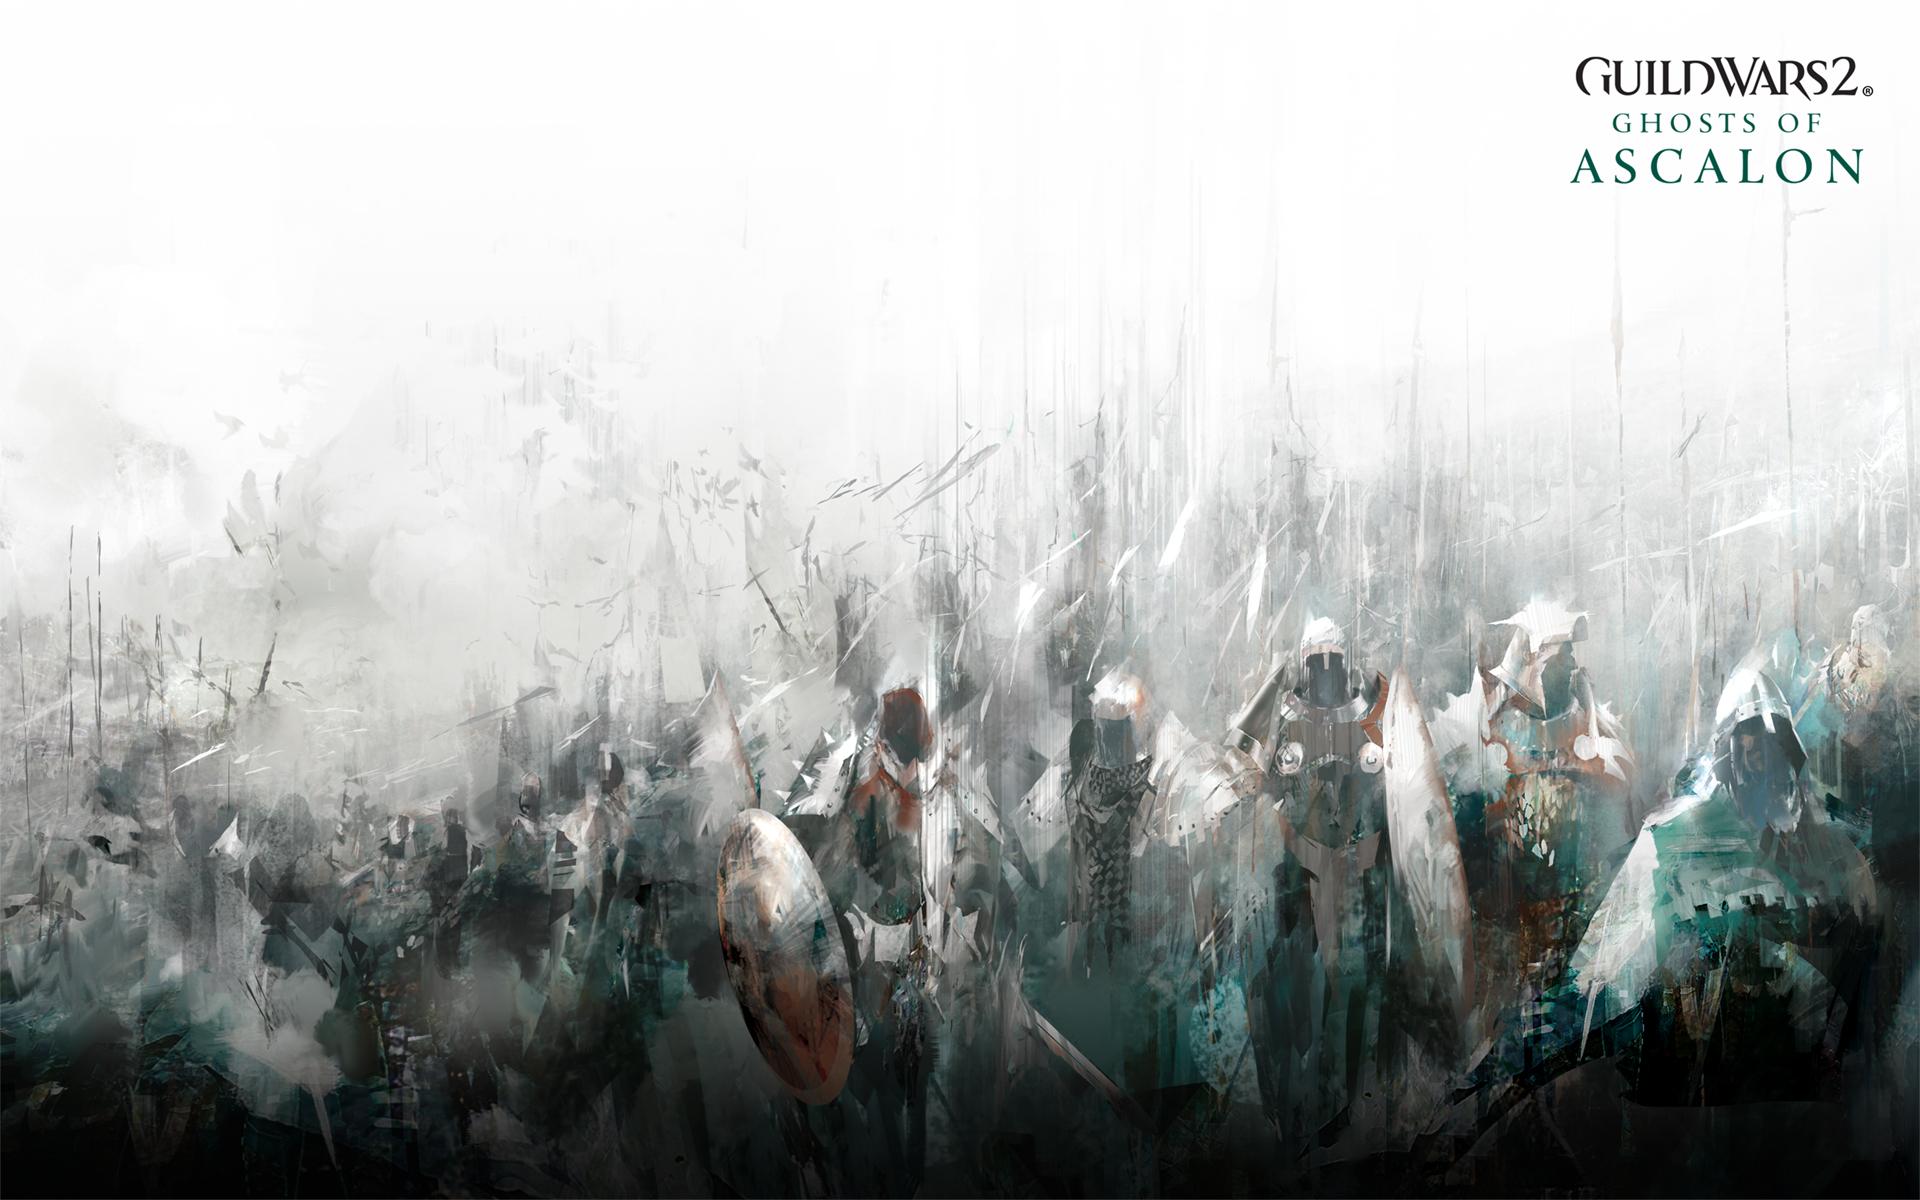 Guild Wars 2 wallpaper 7